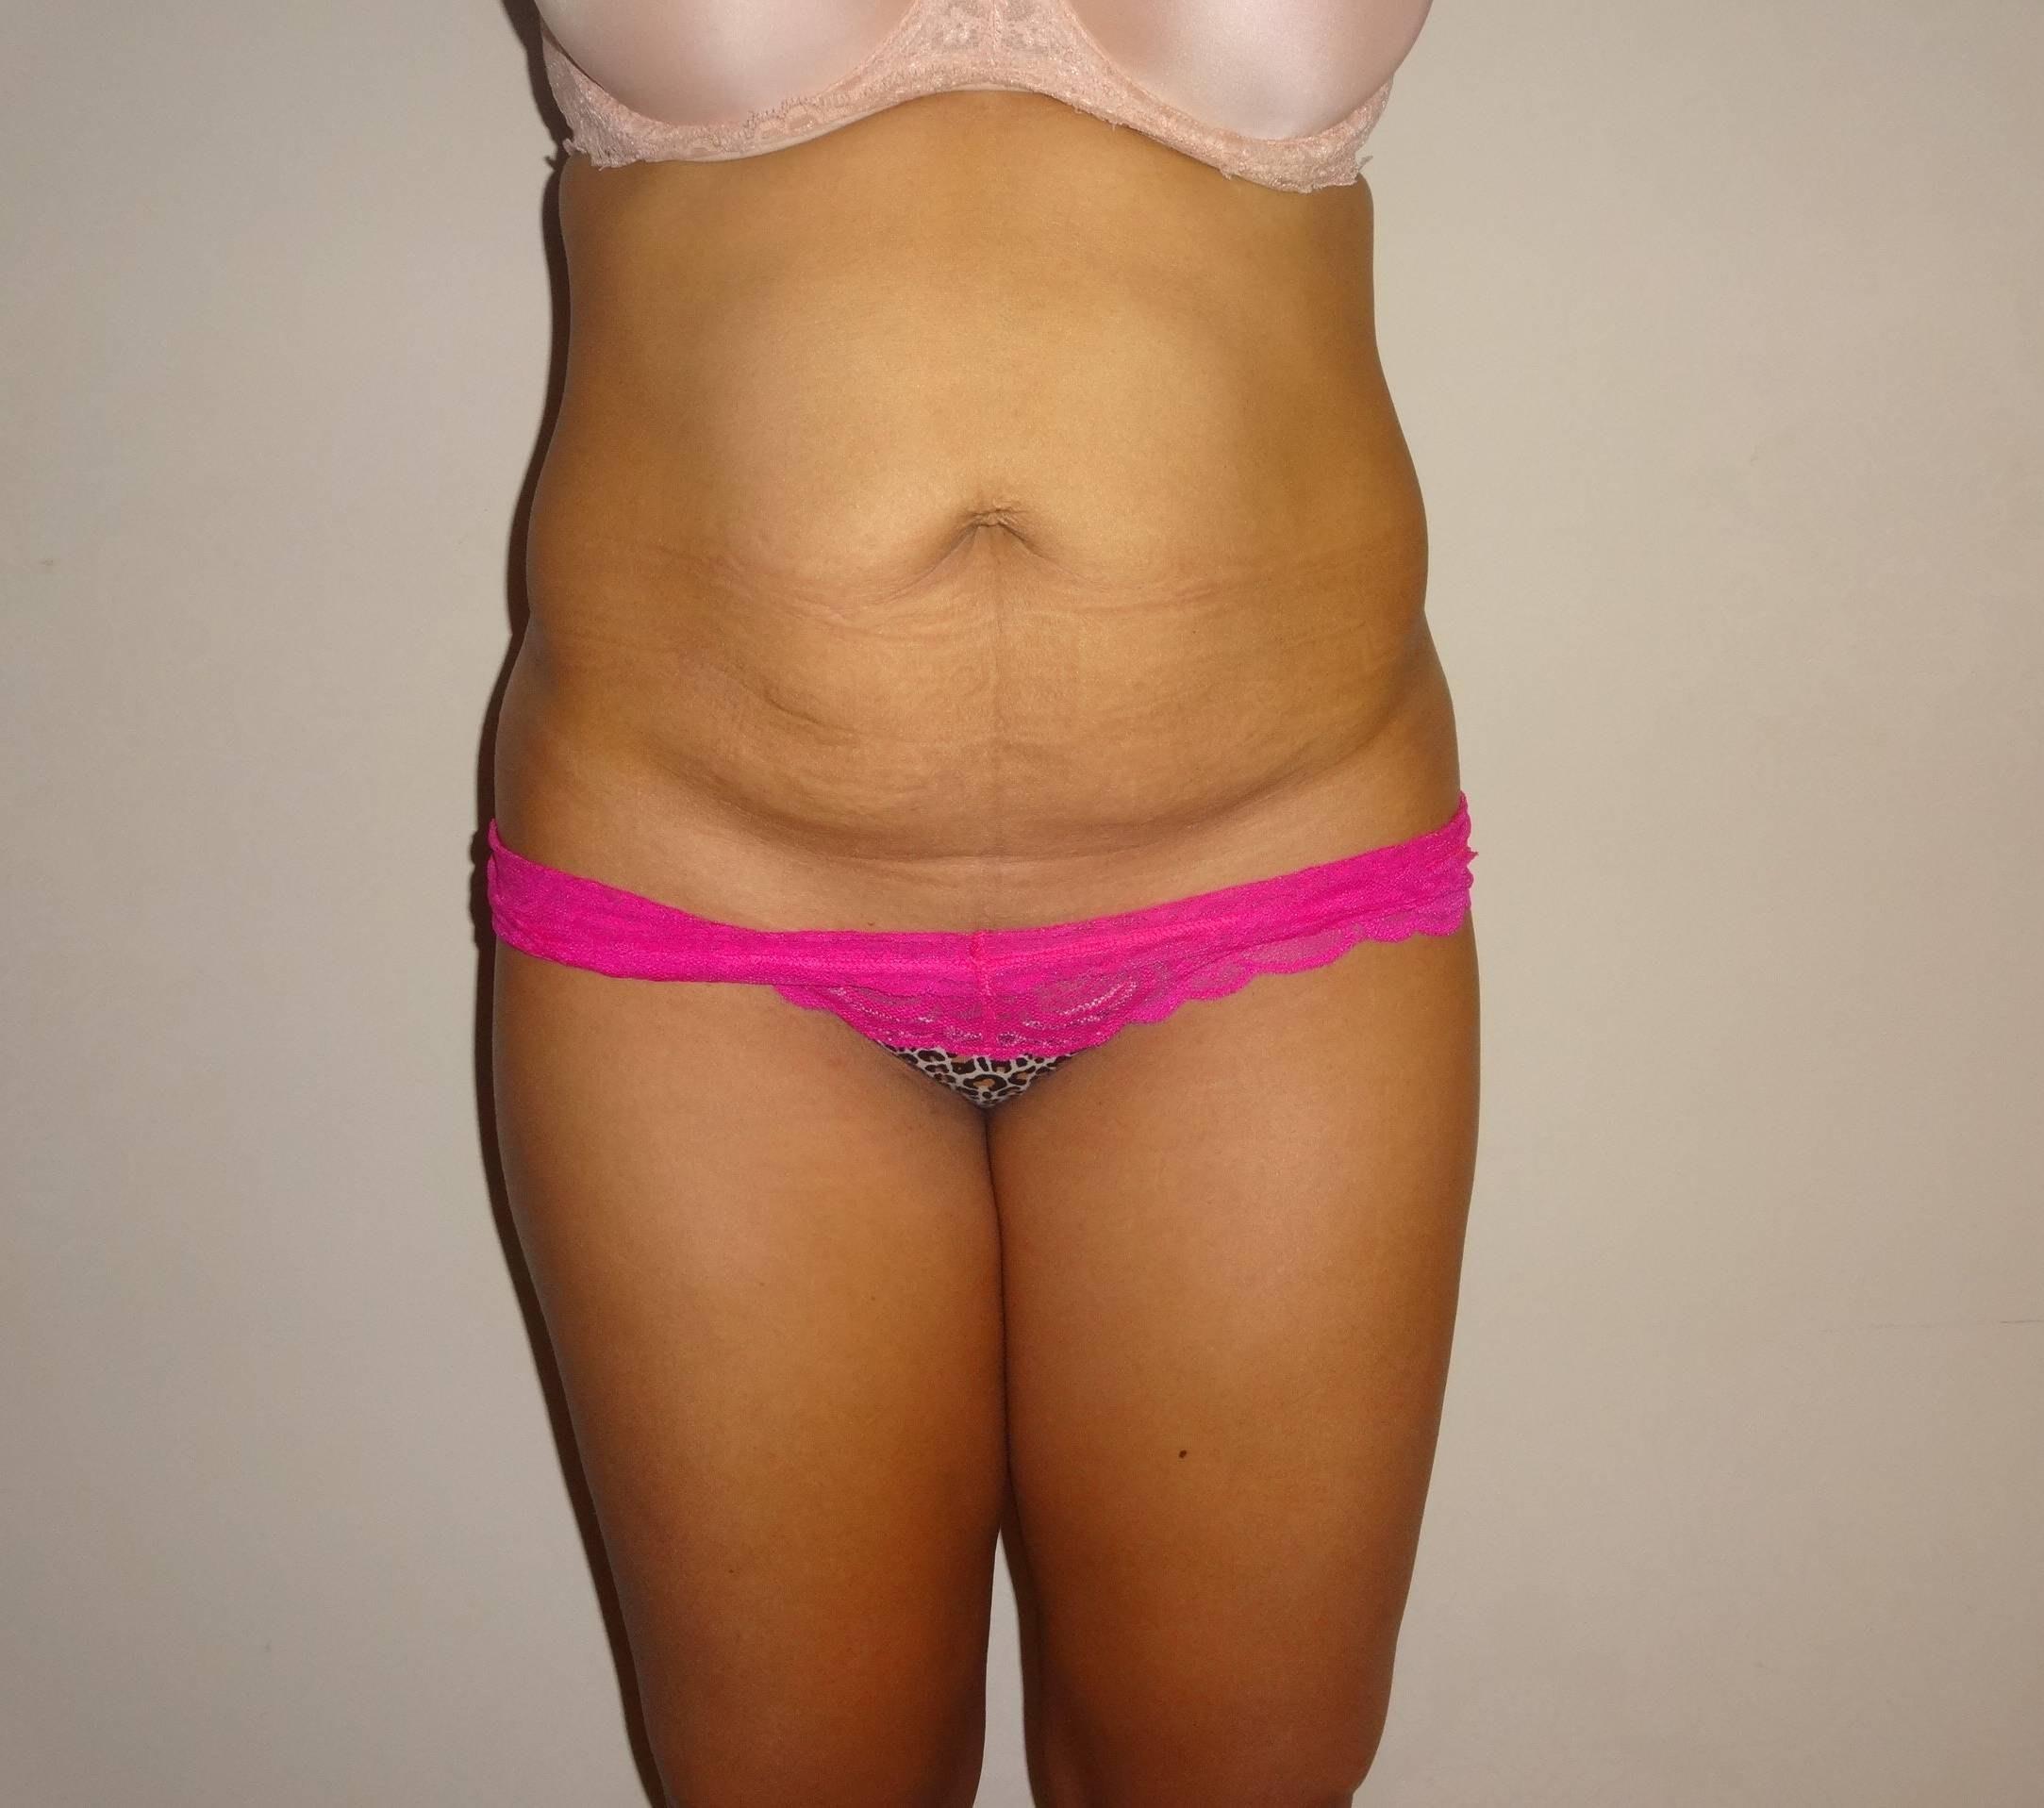 Tummy Tuck (Abdominoplasty) Gallery - Patient 4448805 - Image 1